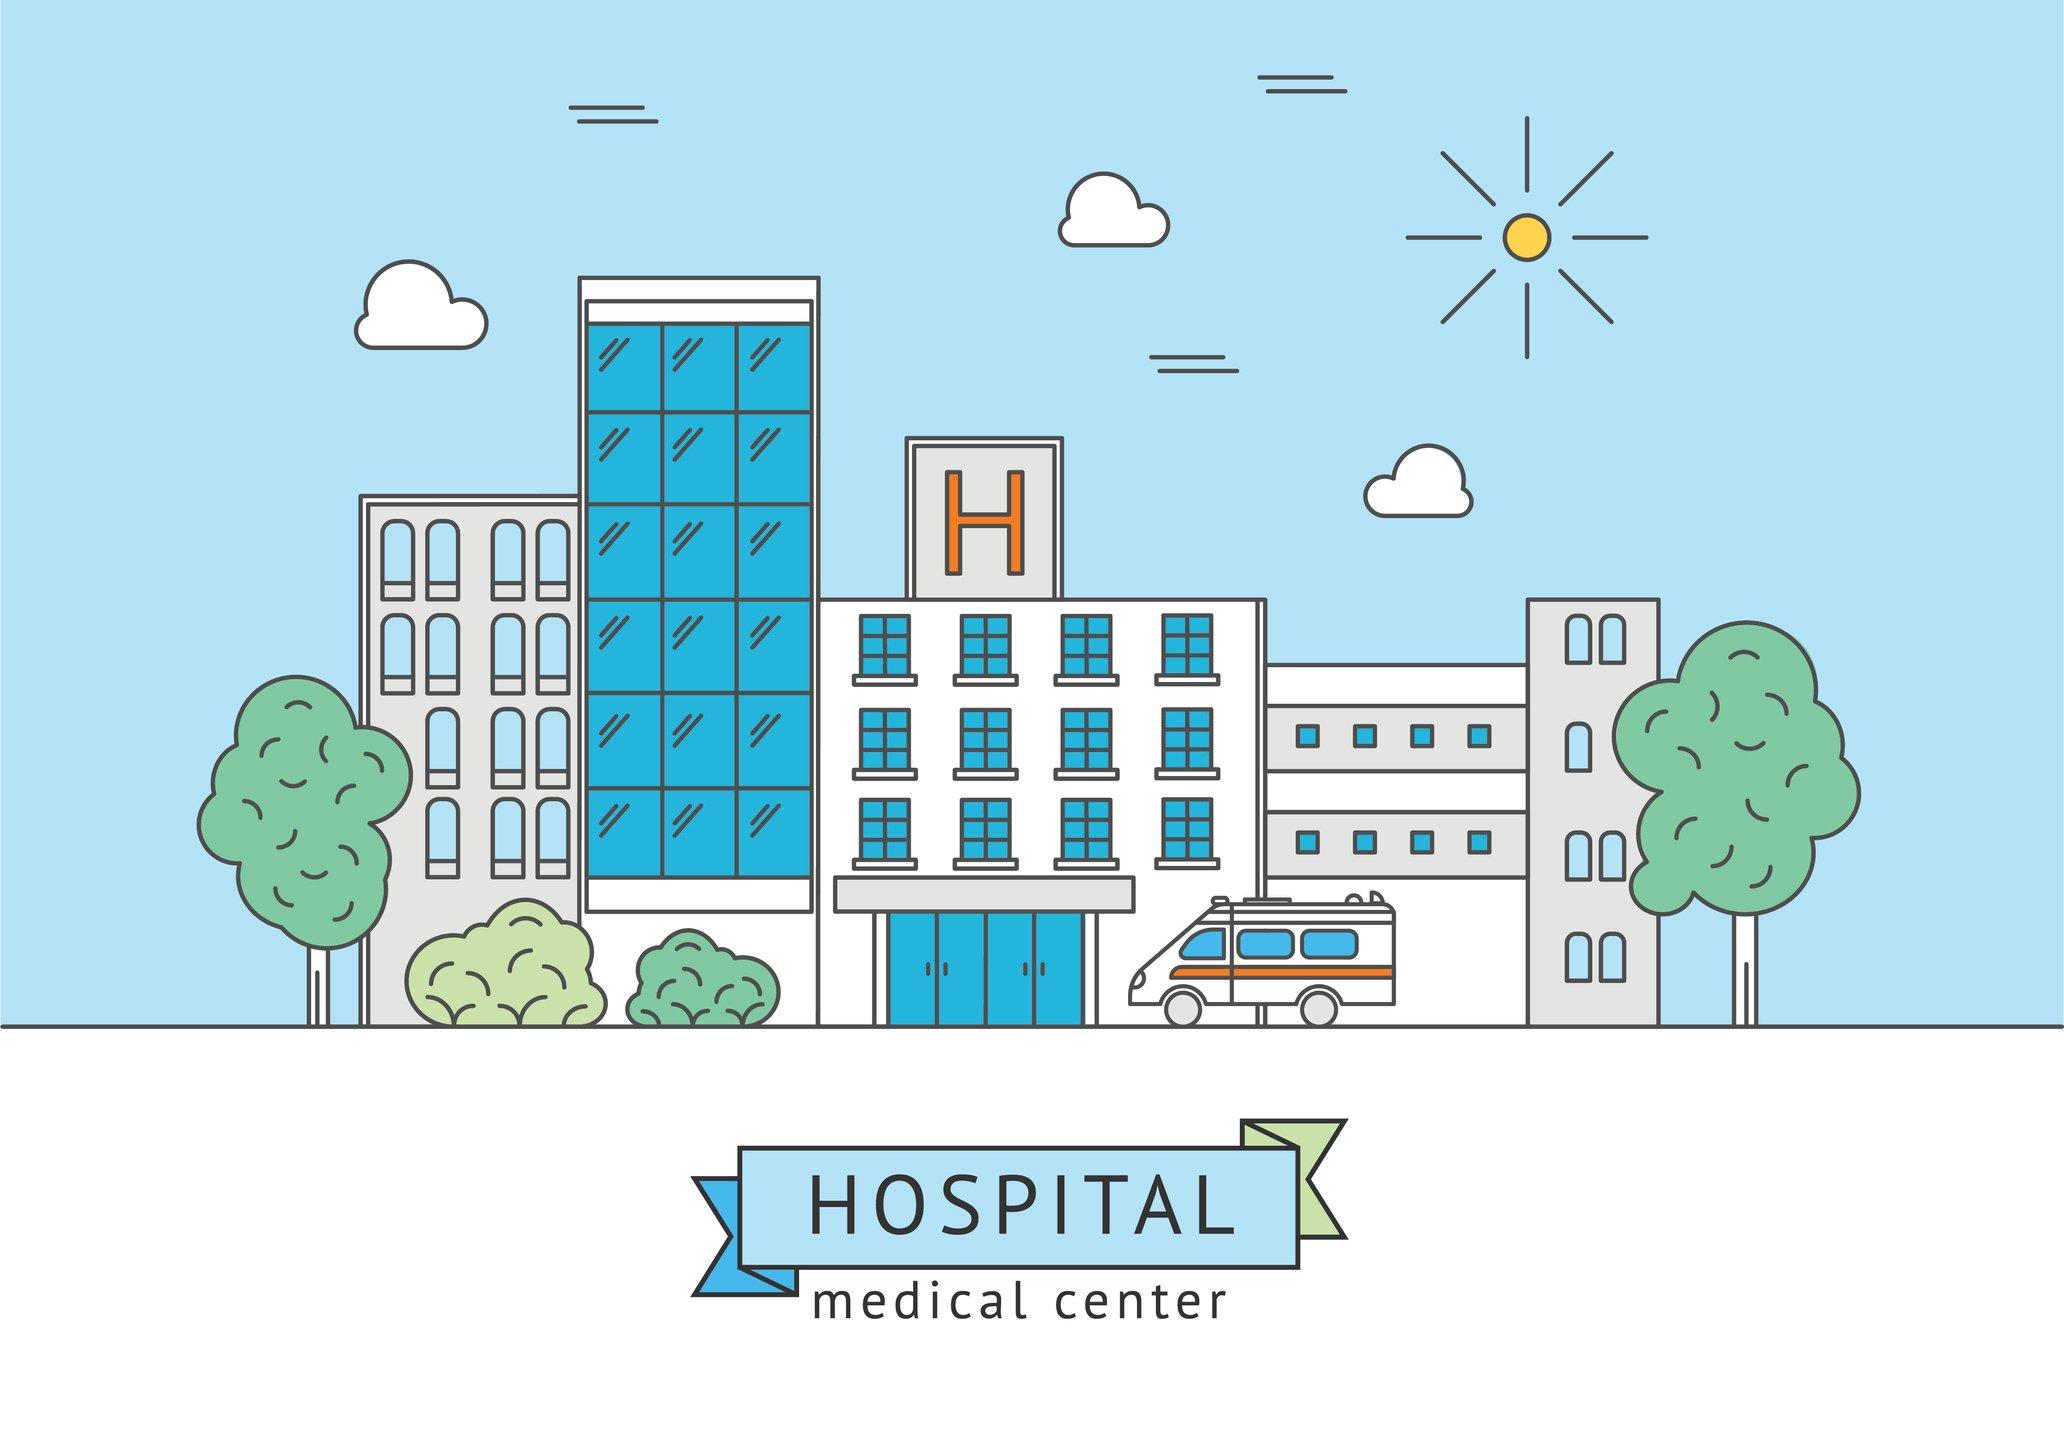 hospitalbuilding